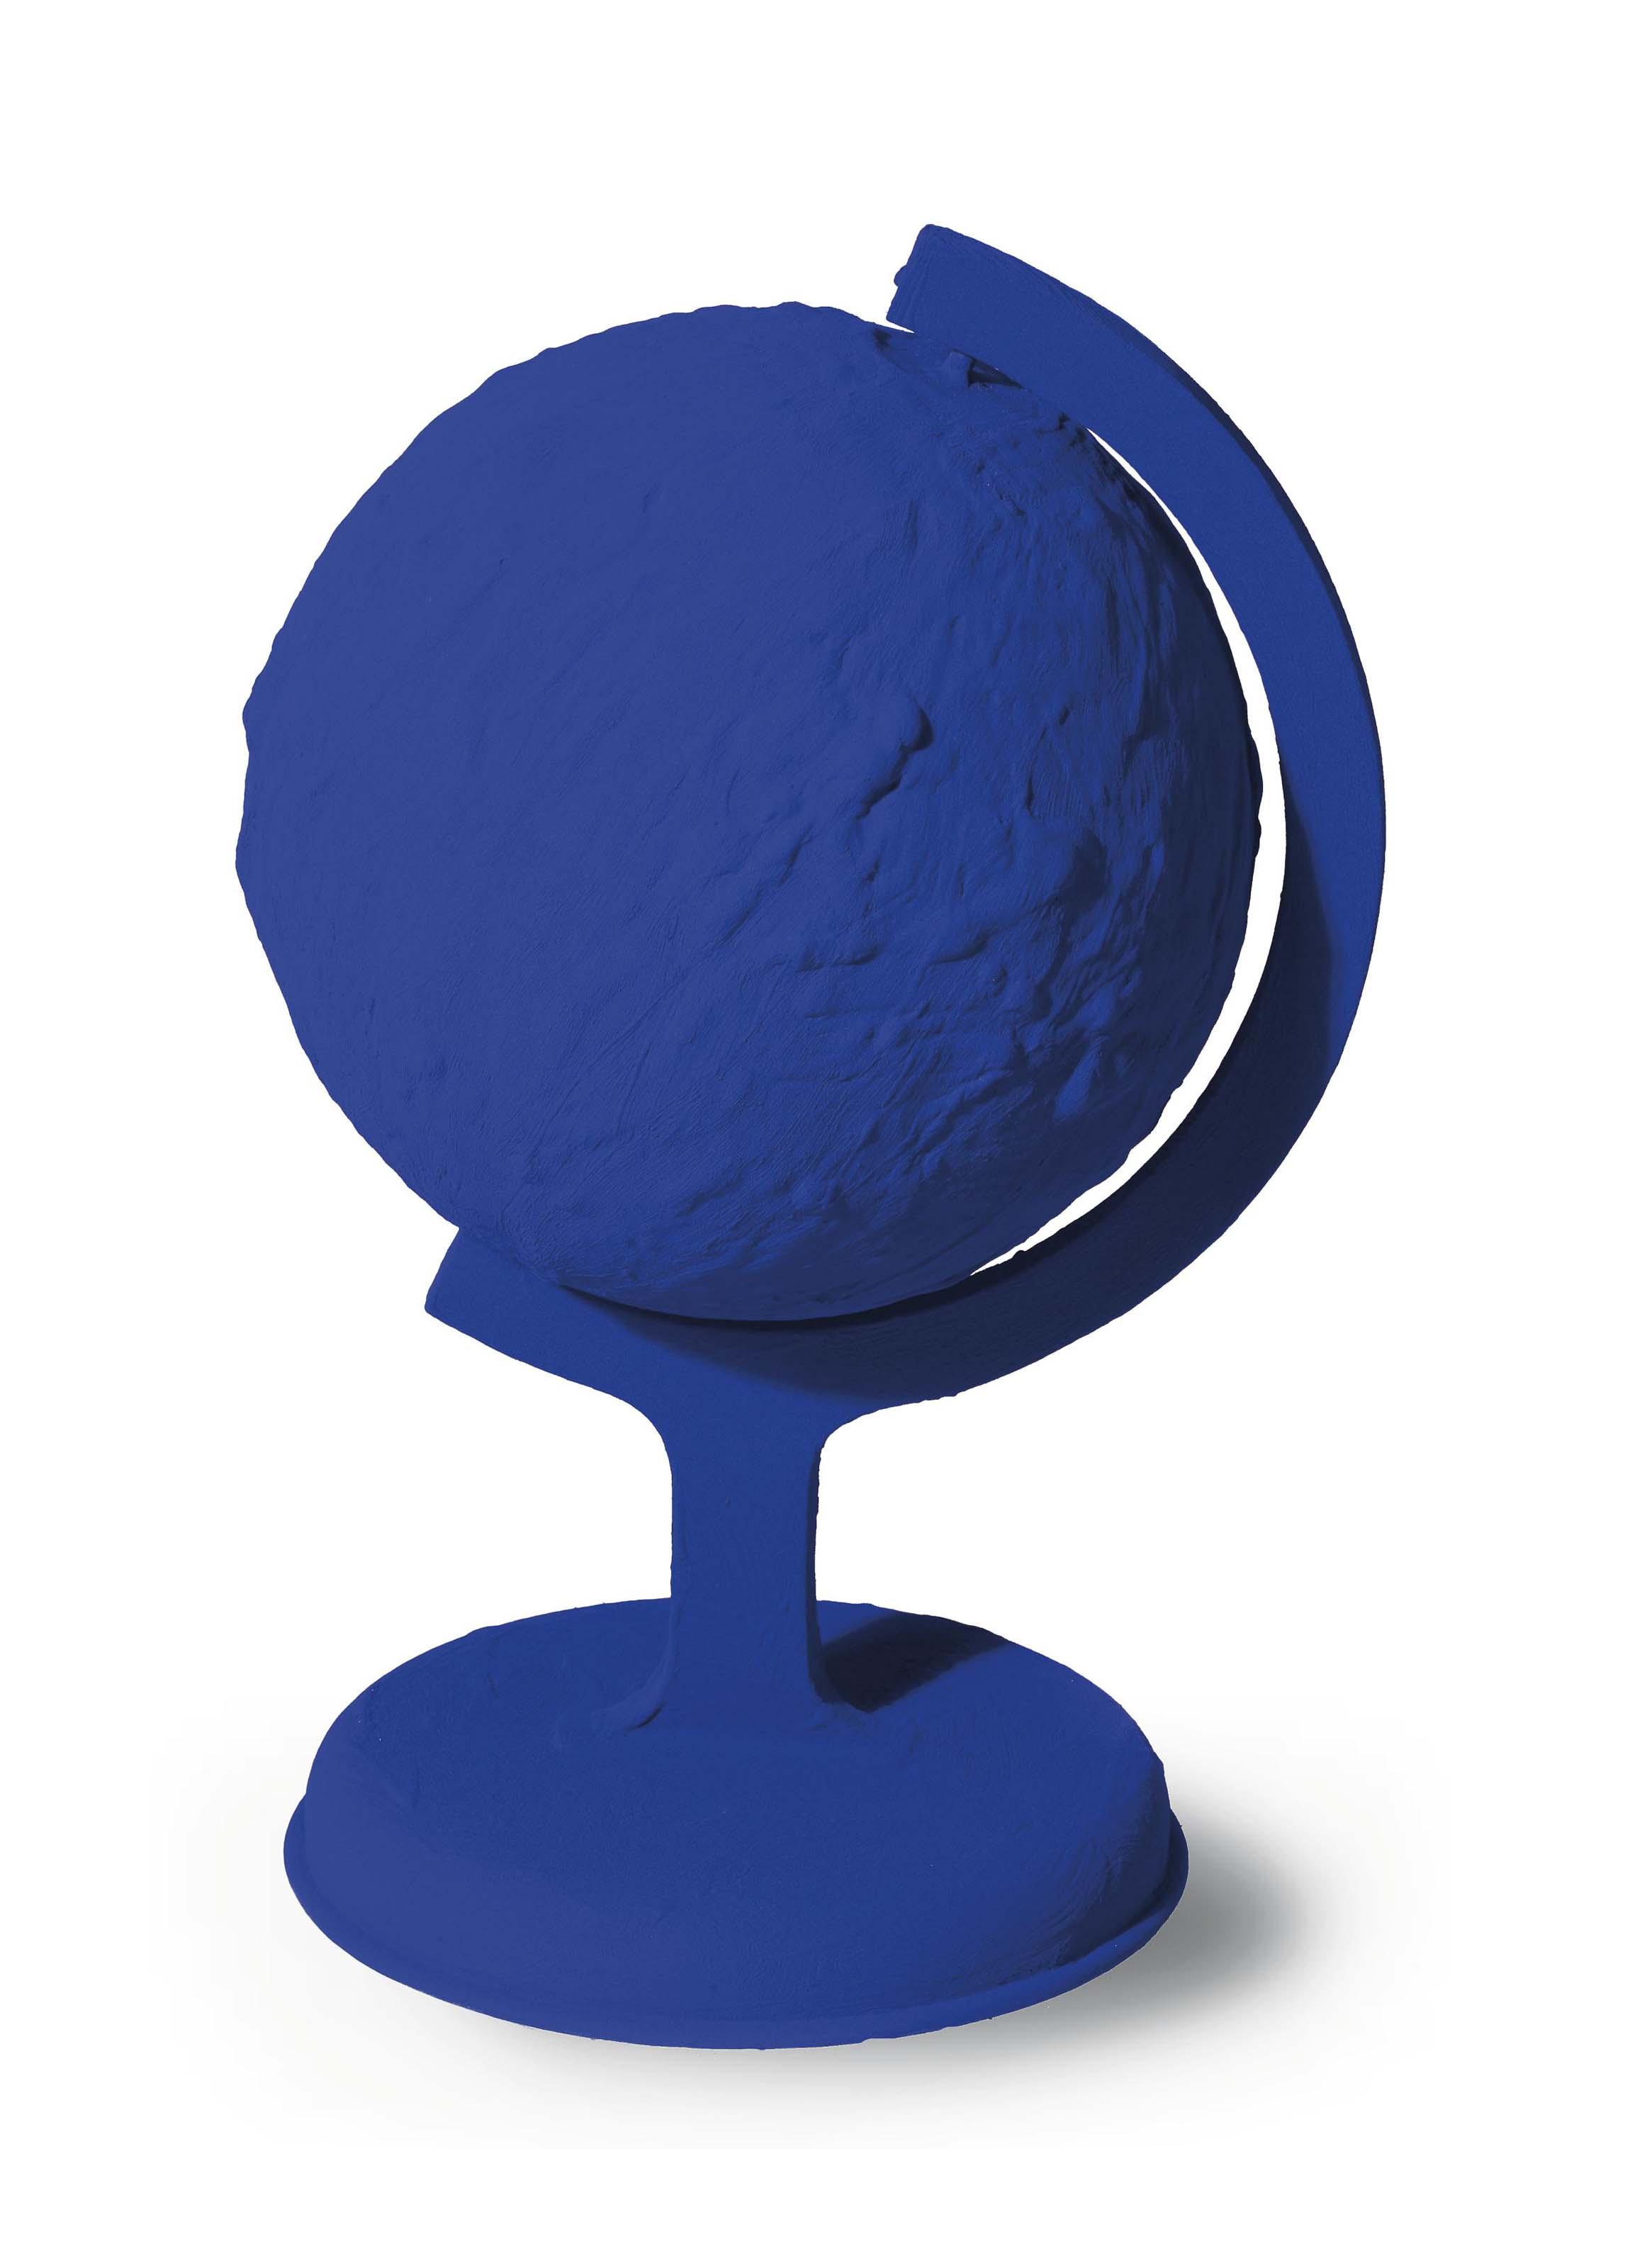 yves klein 1928 1962 la terre bleue christie 39 s. Black Bedroom Furniture Sets. Home Design Ideas